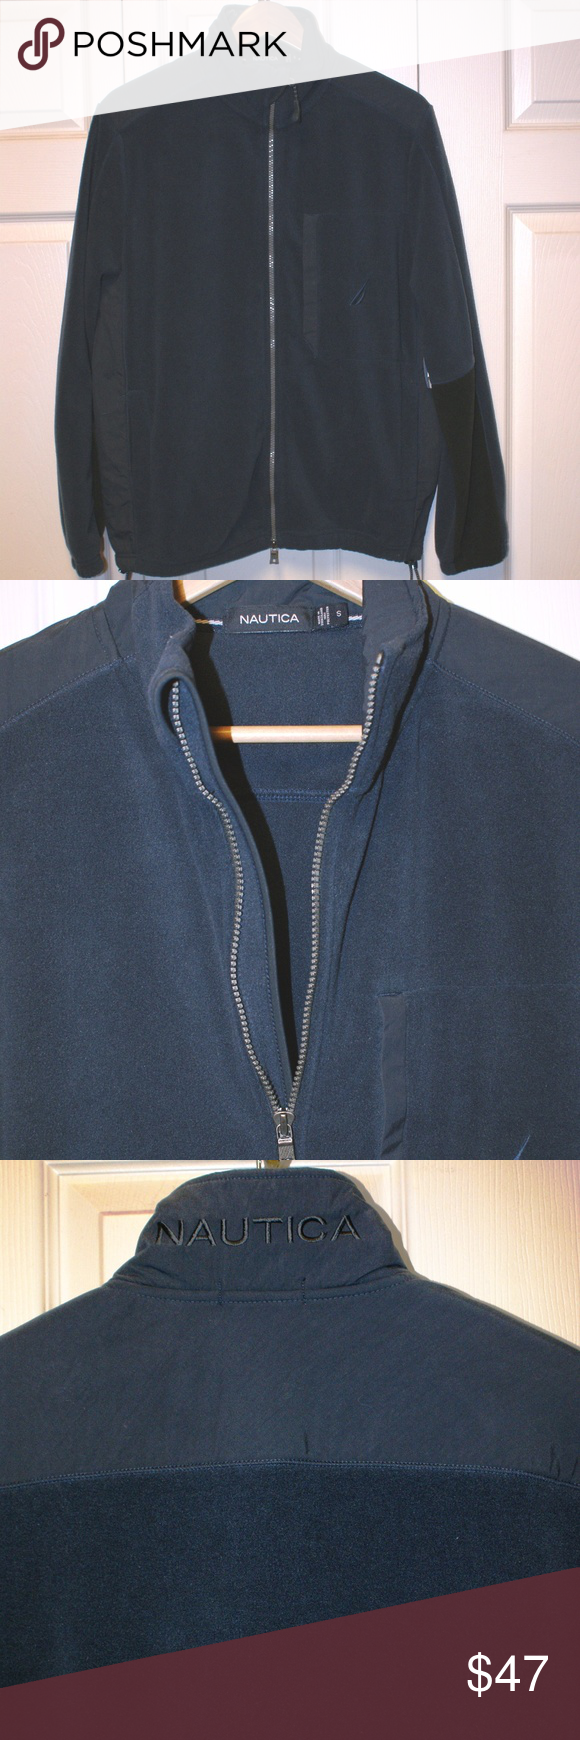 Menus nautica fleece jacket small nwt smoking and zip